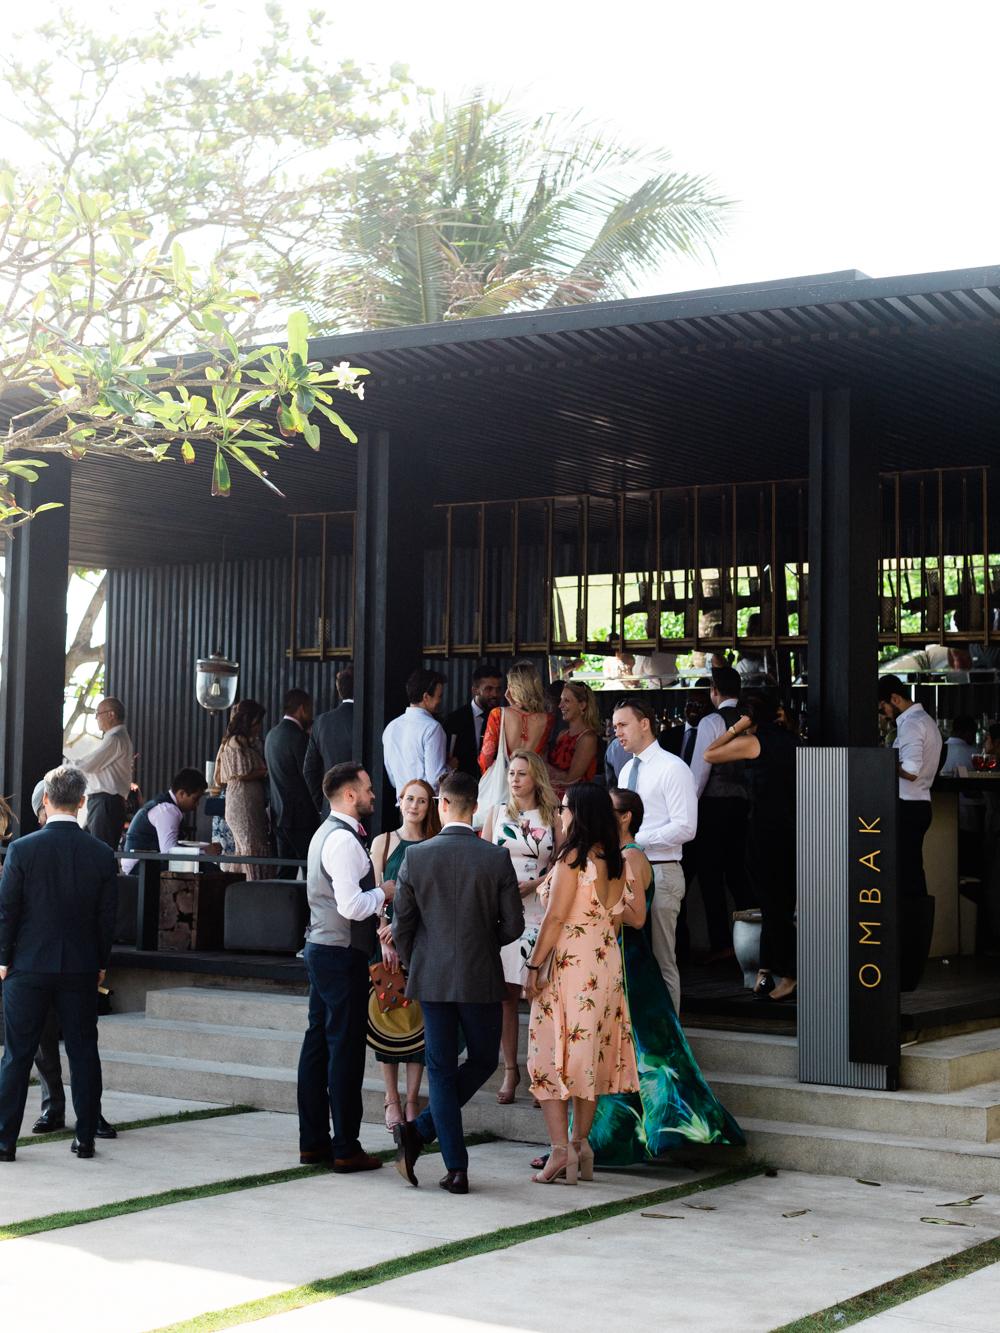 Bali_Real_Wedding_(c)_Rory_Wylie-57.jpg